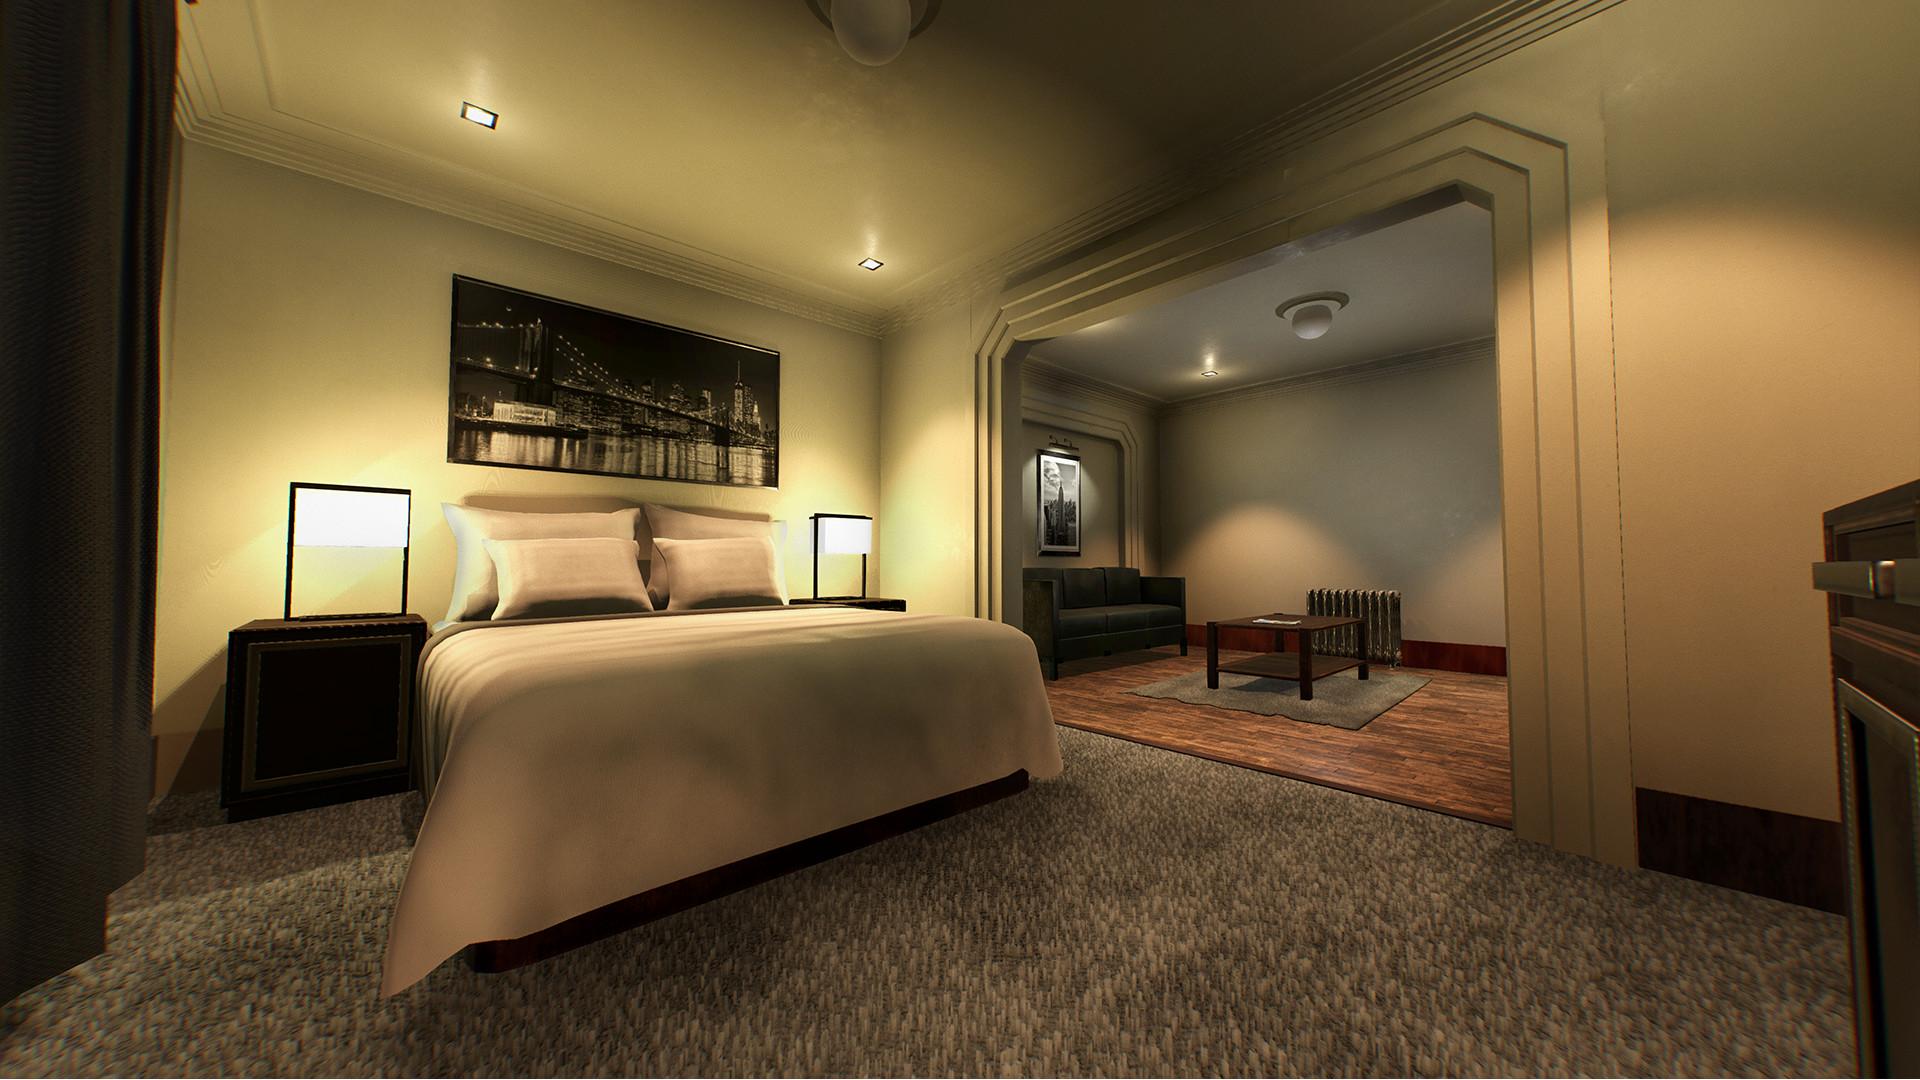 Augustin grassien bedroommodern 01